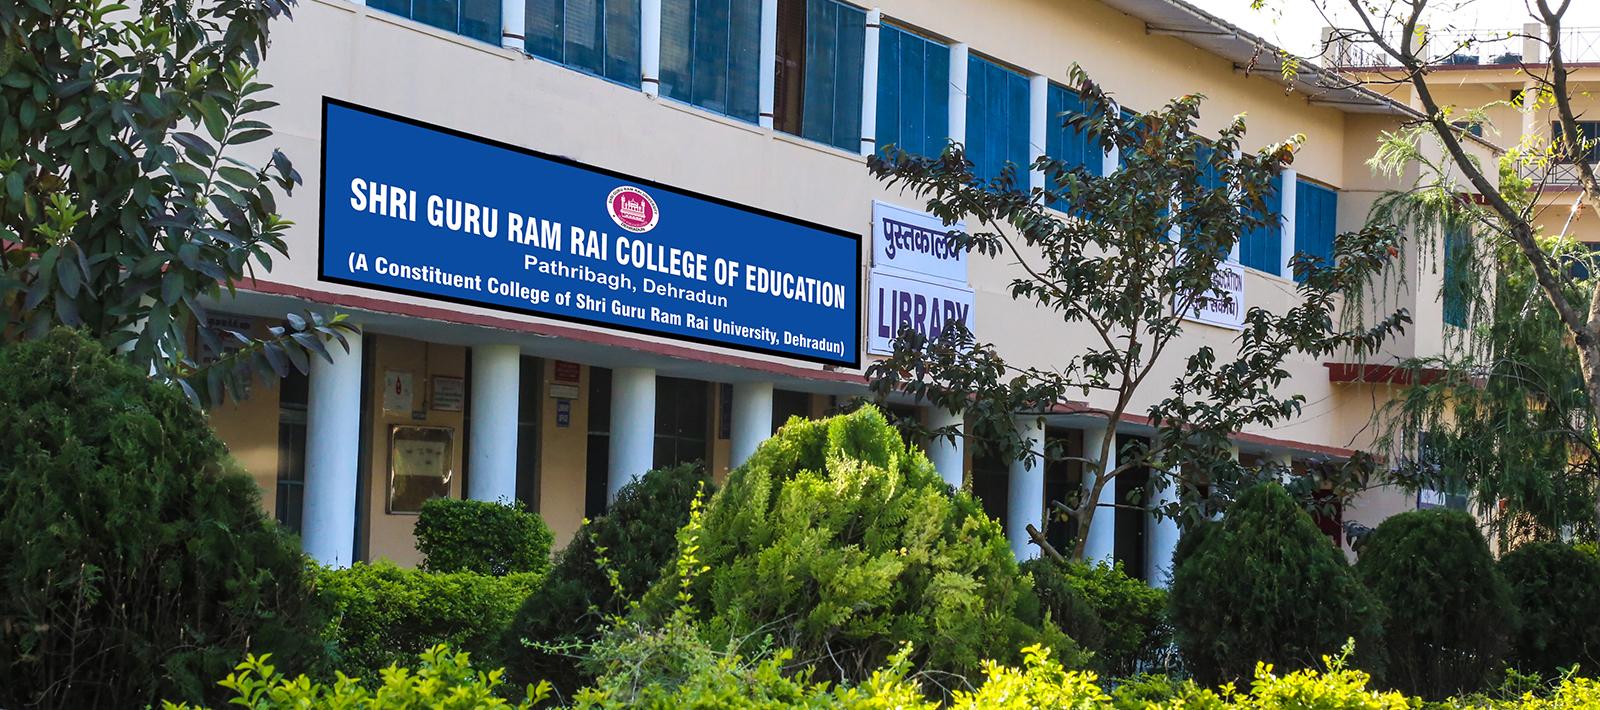 Shri Guru Ram Rai College of Education, Dehradun Image